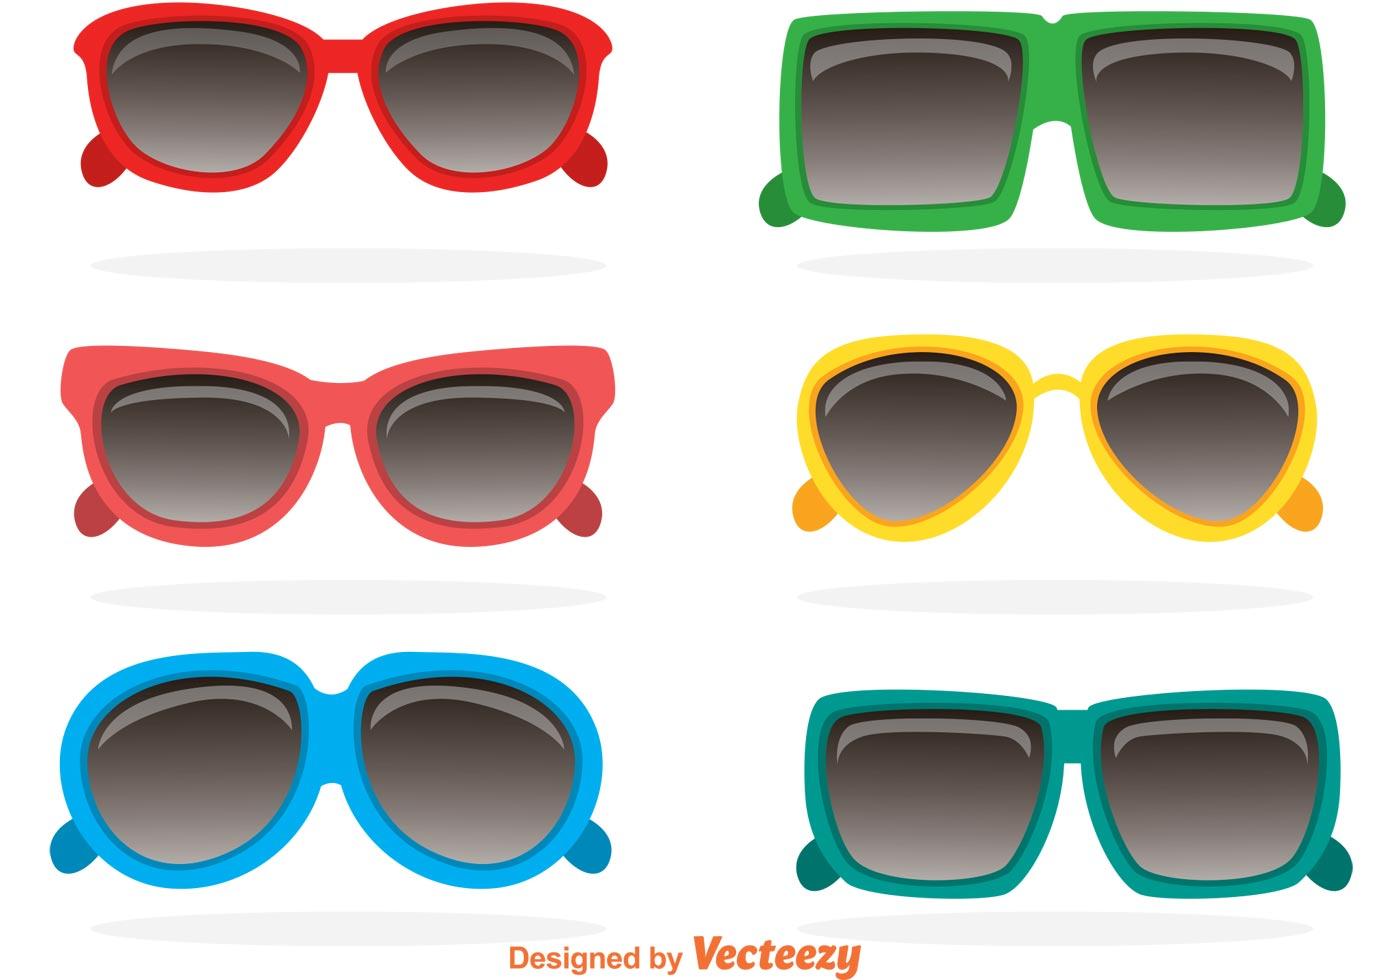 353700819904 Colorful 80s Sunglasses. Colorful 80s Sunglasses. Rainbow Sunglasses Vectors  · Rainbow Sunglasses Vectors. Rainbow Sunglasses Vectors